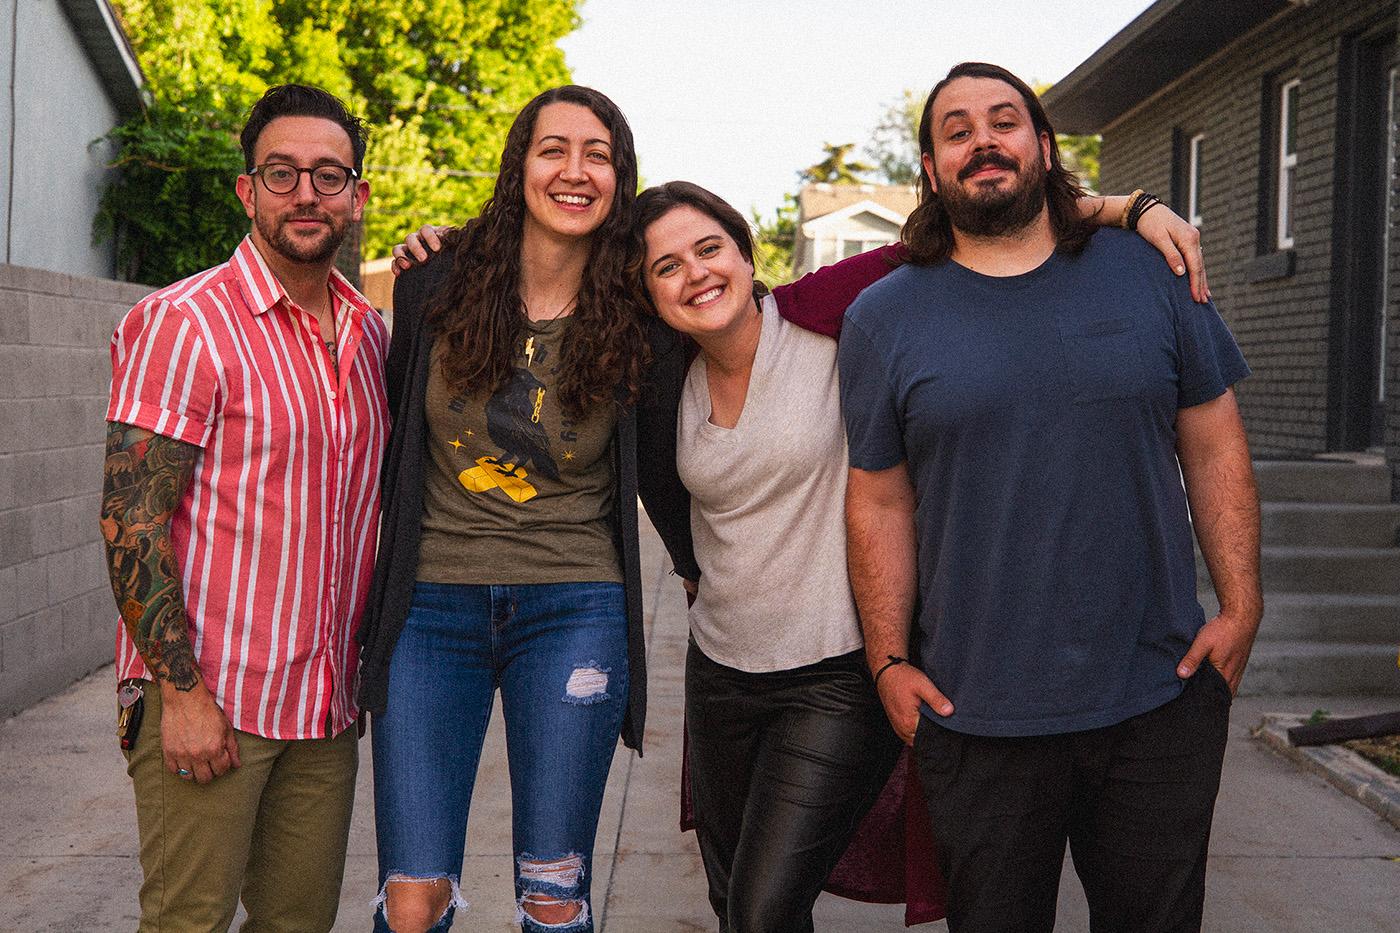 (L–R) Jamison Cerva, Liz Aponte, Jacquelyn Cerva and Dallin Cerva of No Shooting Friends, Joseph.